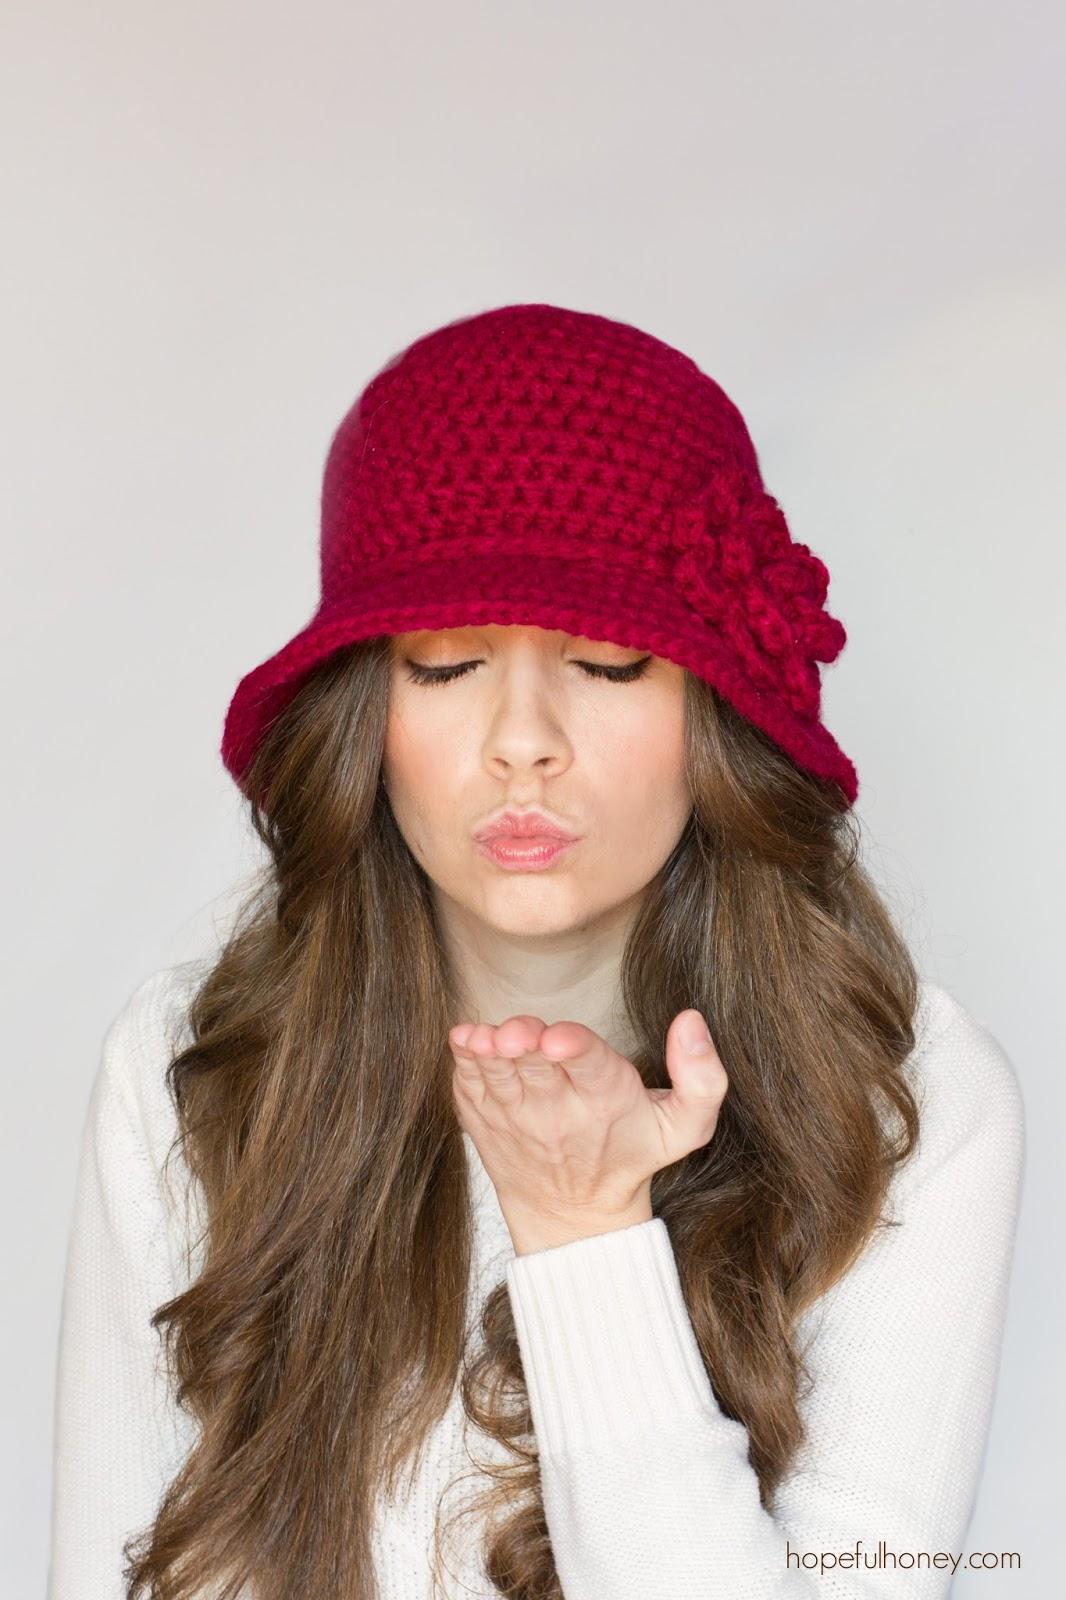 Pattern Crochet Cloche Hat : Hopeful Honey Craft, Crochet, Create: 1920s Cloche Hat ...